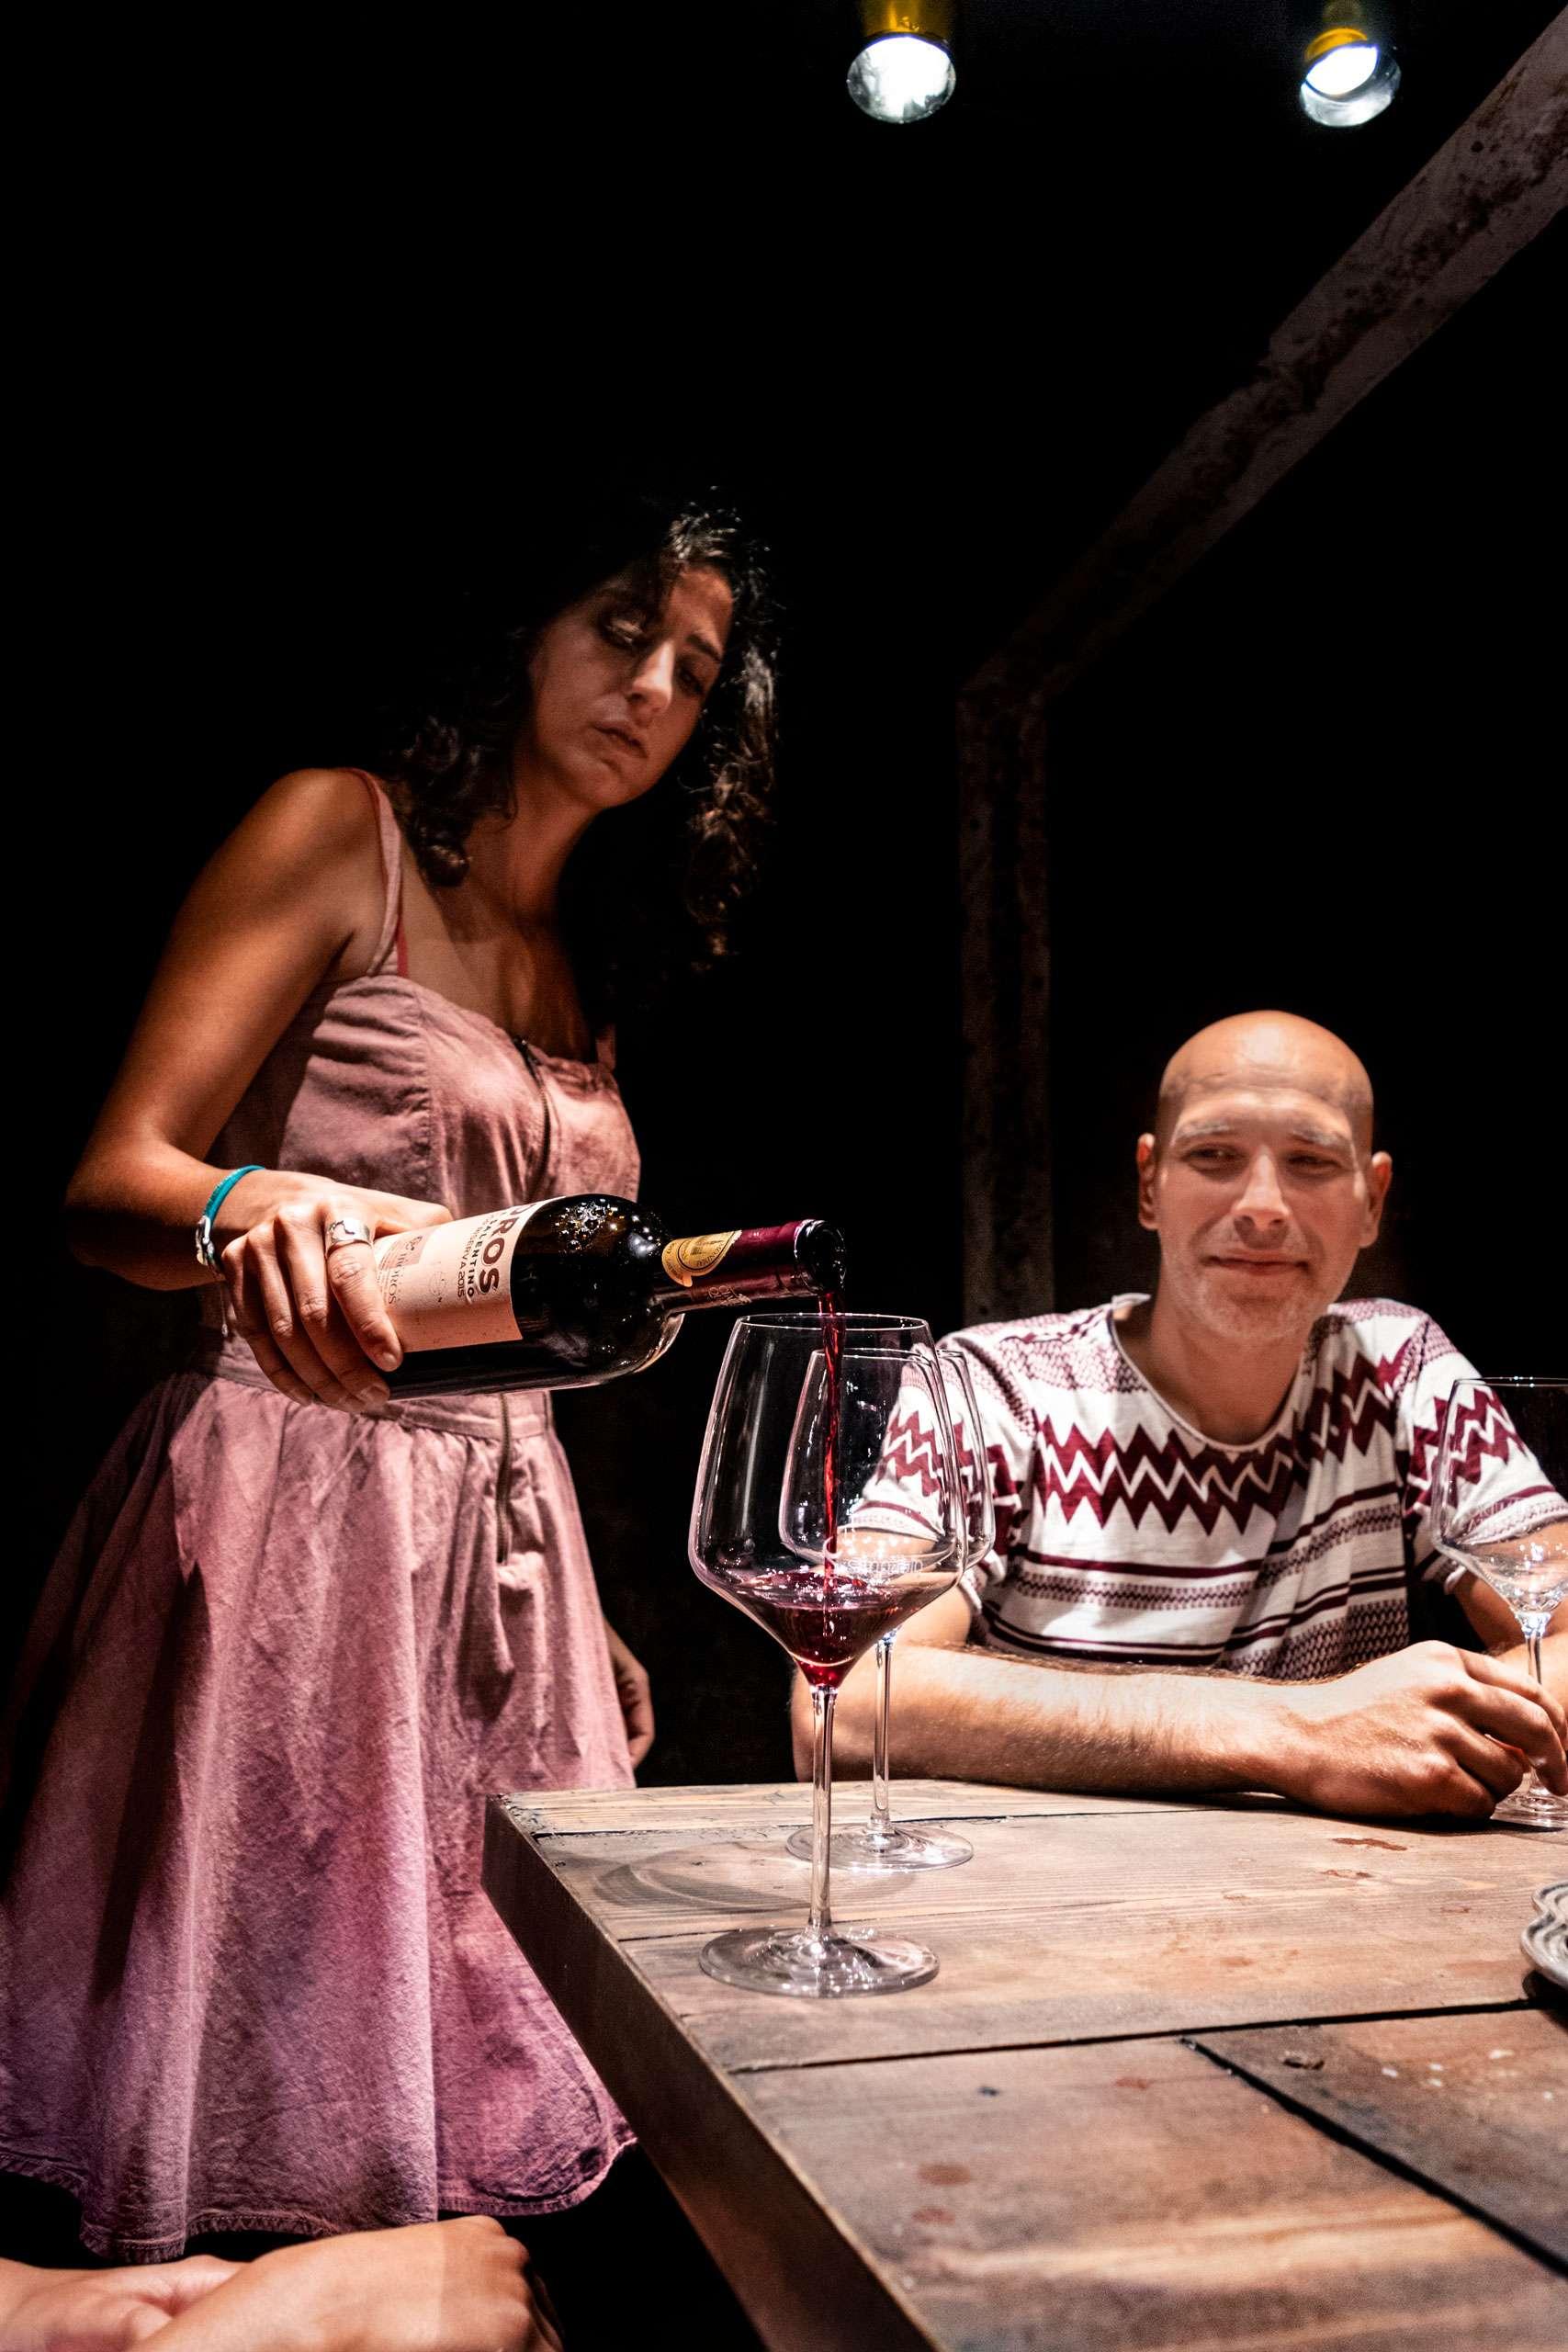 Partner winey with the B&B in Puglia Corte dei Furesi | Salento